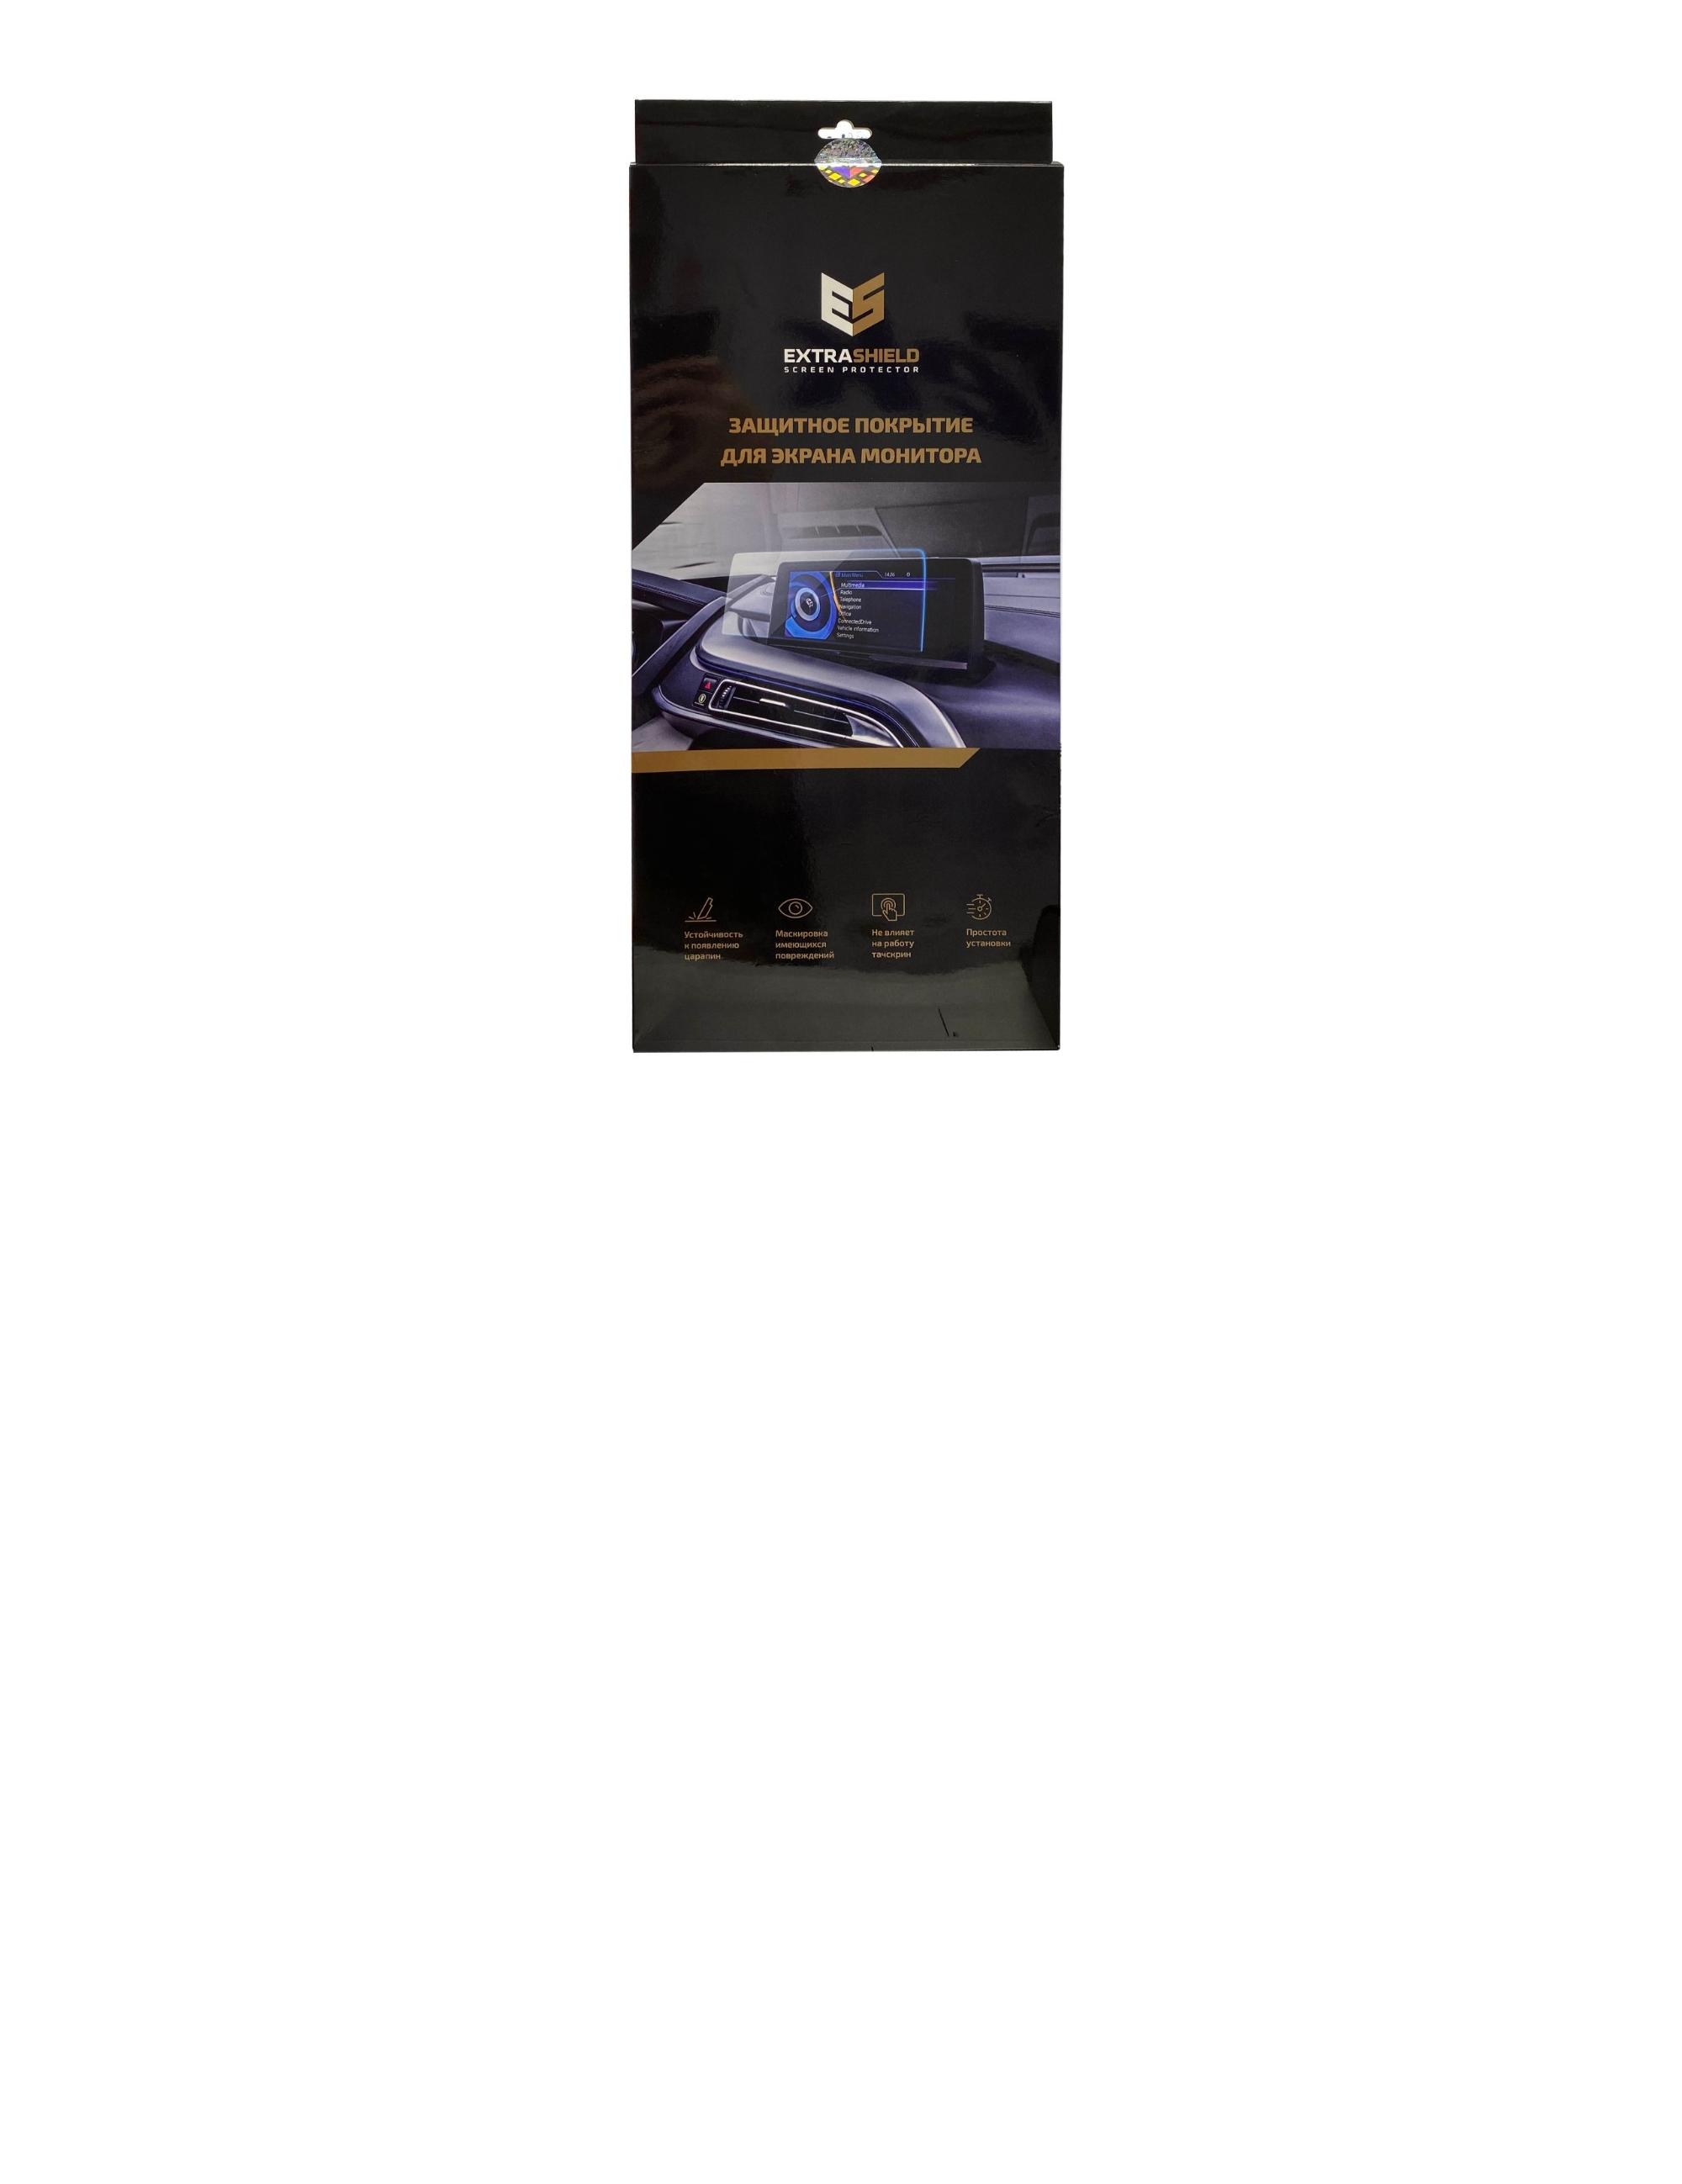 Audi A6 (С7) 2014 - 2018 мультимедиа MMI 8 Защитное стекло Глянец